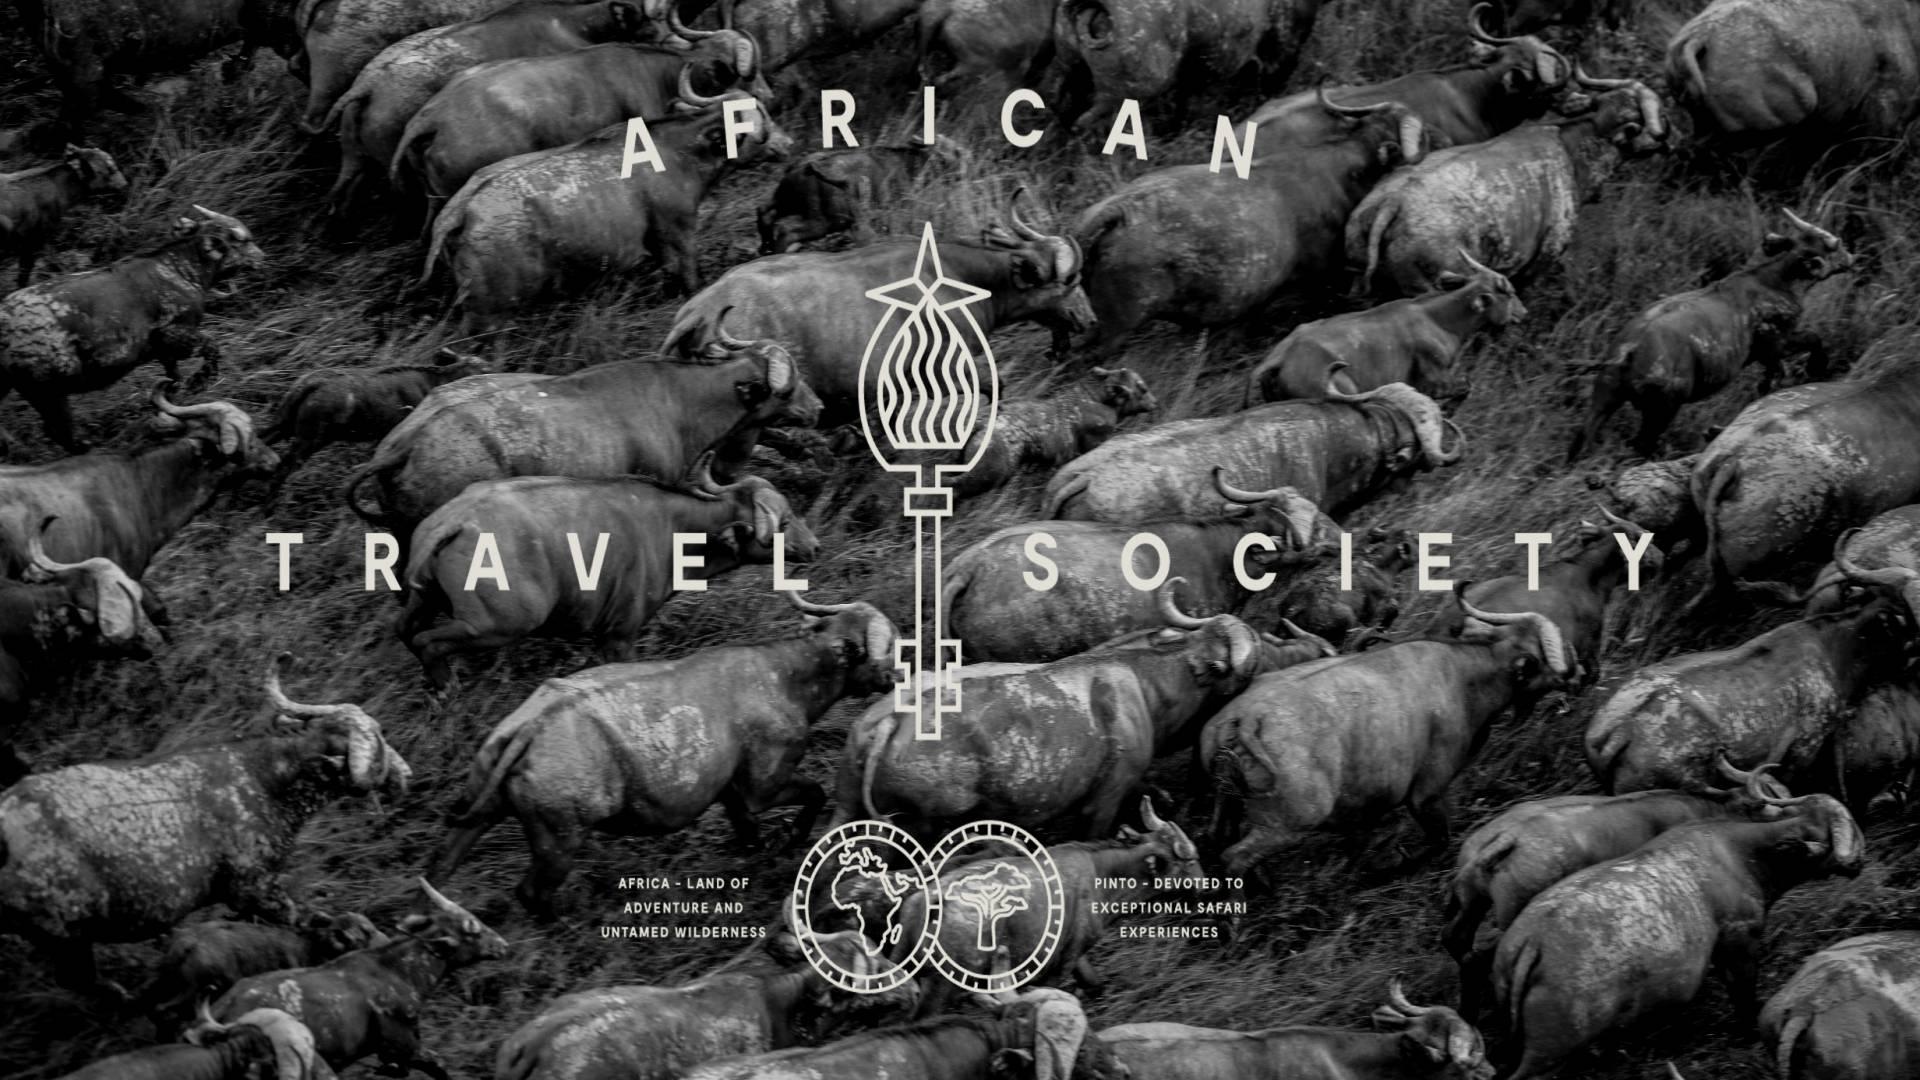 Beste reisezeit Sambia africa travel society pinto africa blog